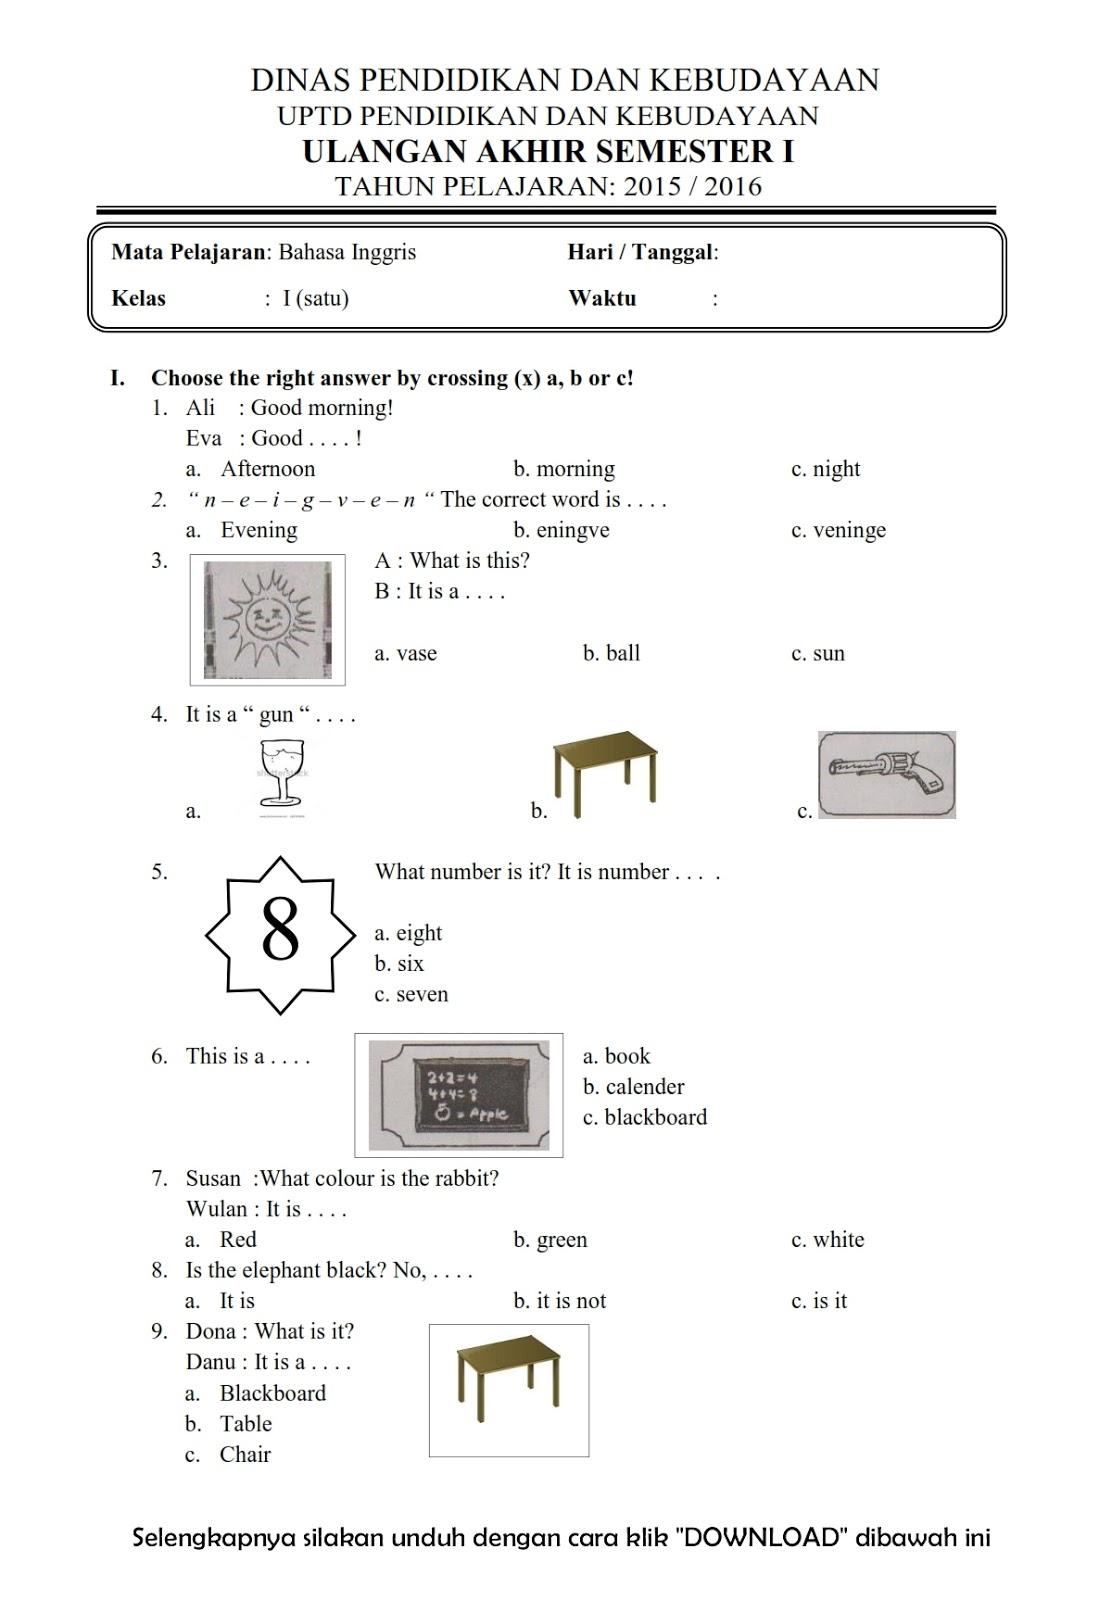 Download Soal Uas Ganjil Bahasa Inggris Kelas 1 Semester 1 2015 2016 Rief Awa Blog